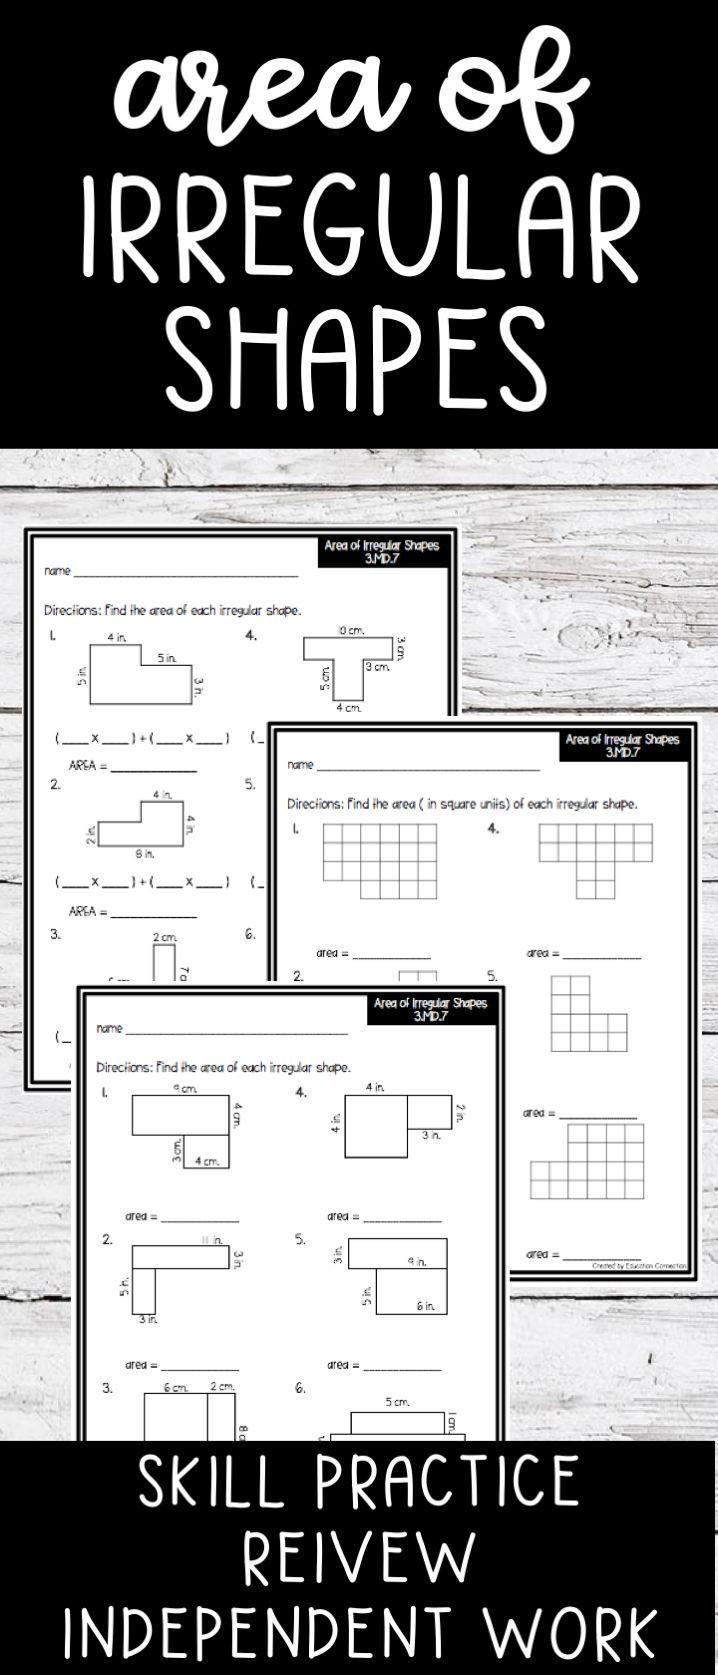 Area Of Irregular Shapes Worksheet area Of Irregular Shapes Worksheets